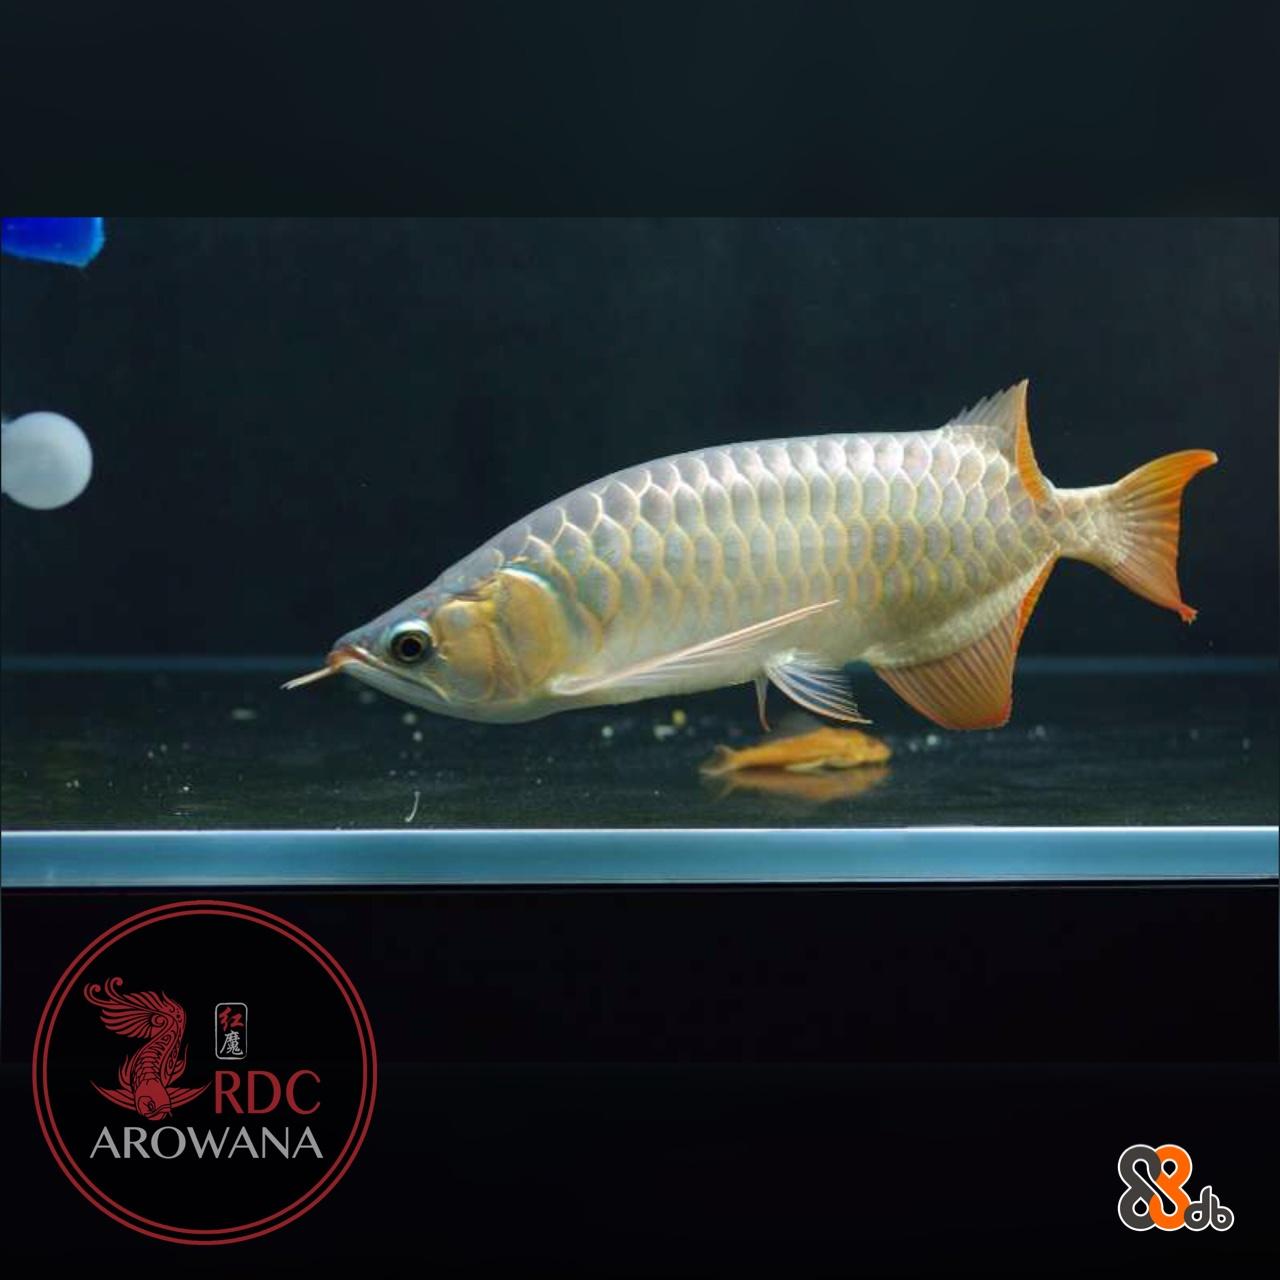 fish,fish,fauna,water,marine biology